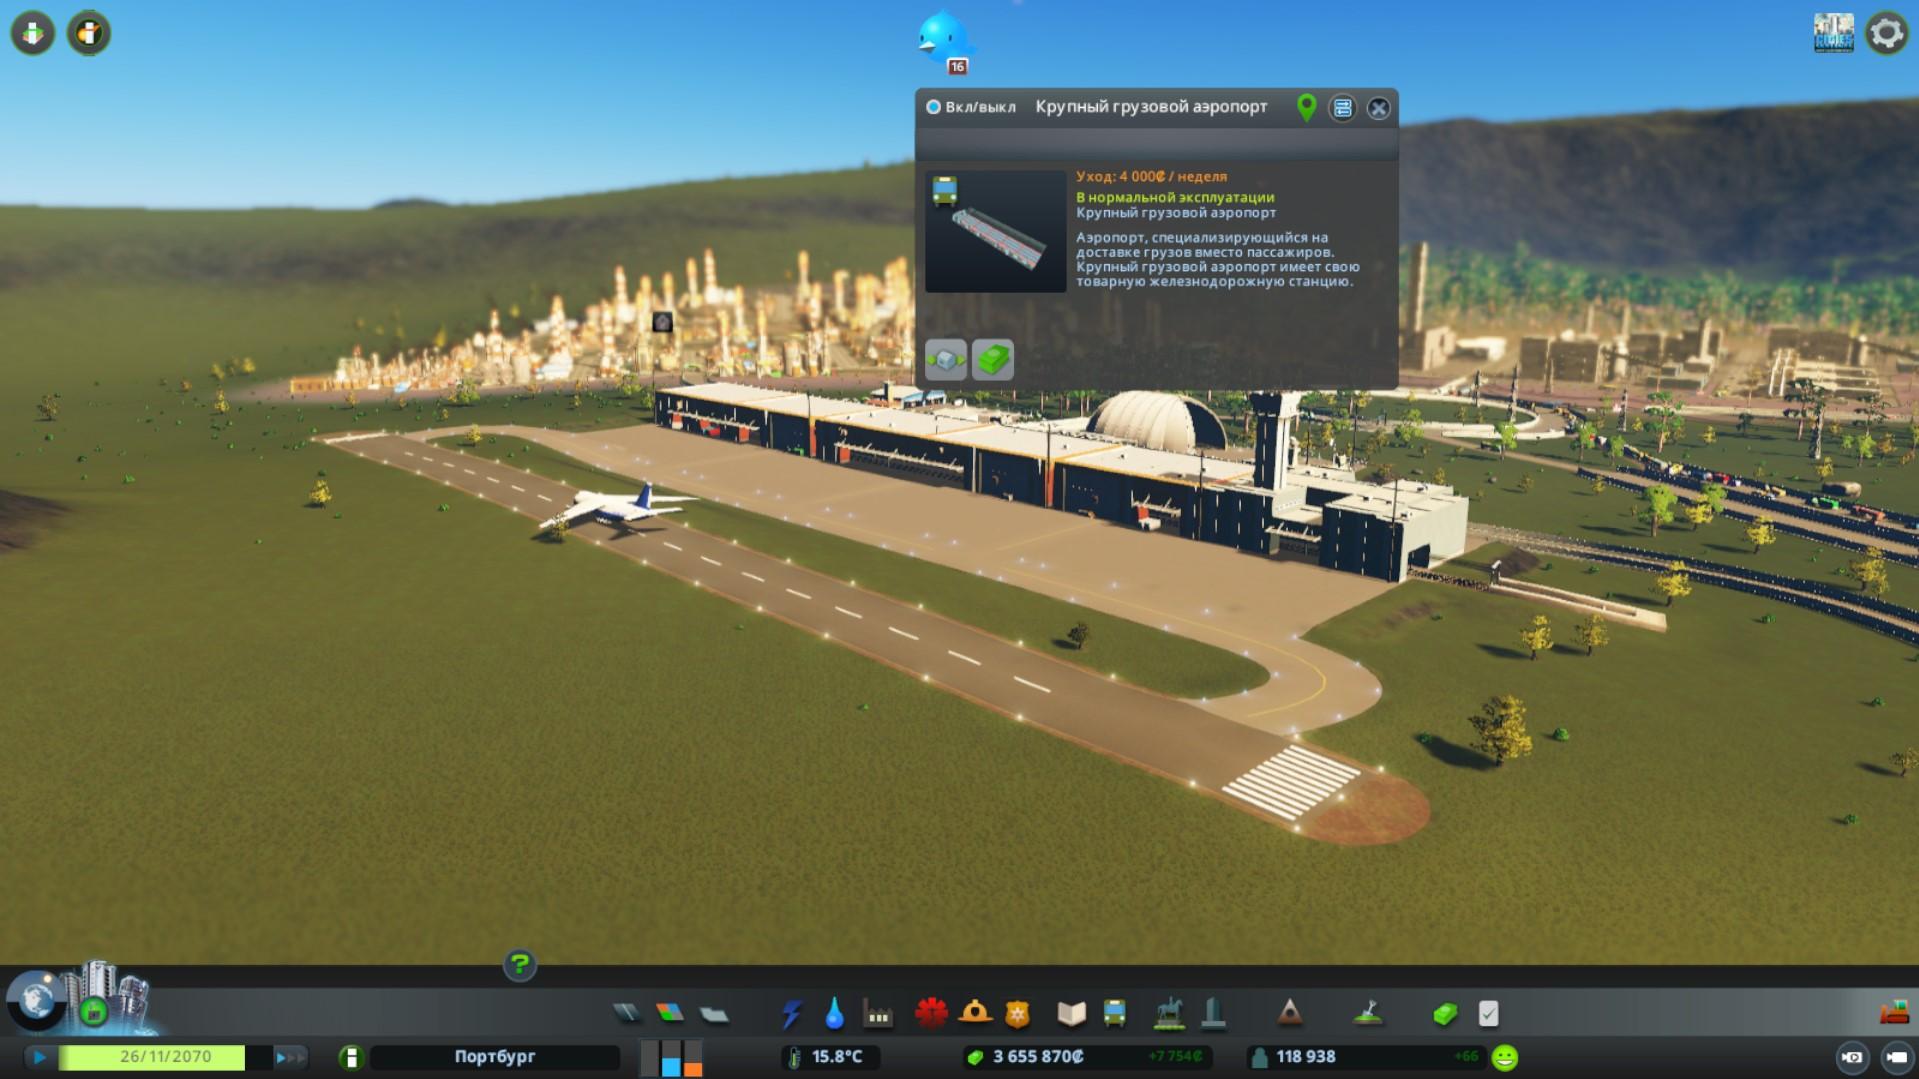 Крупный грузовой аэропорт cities skyline